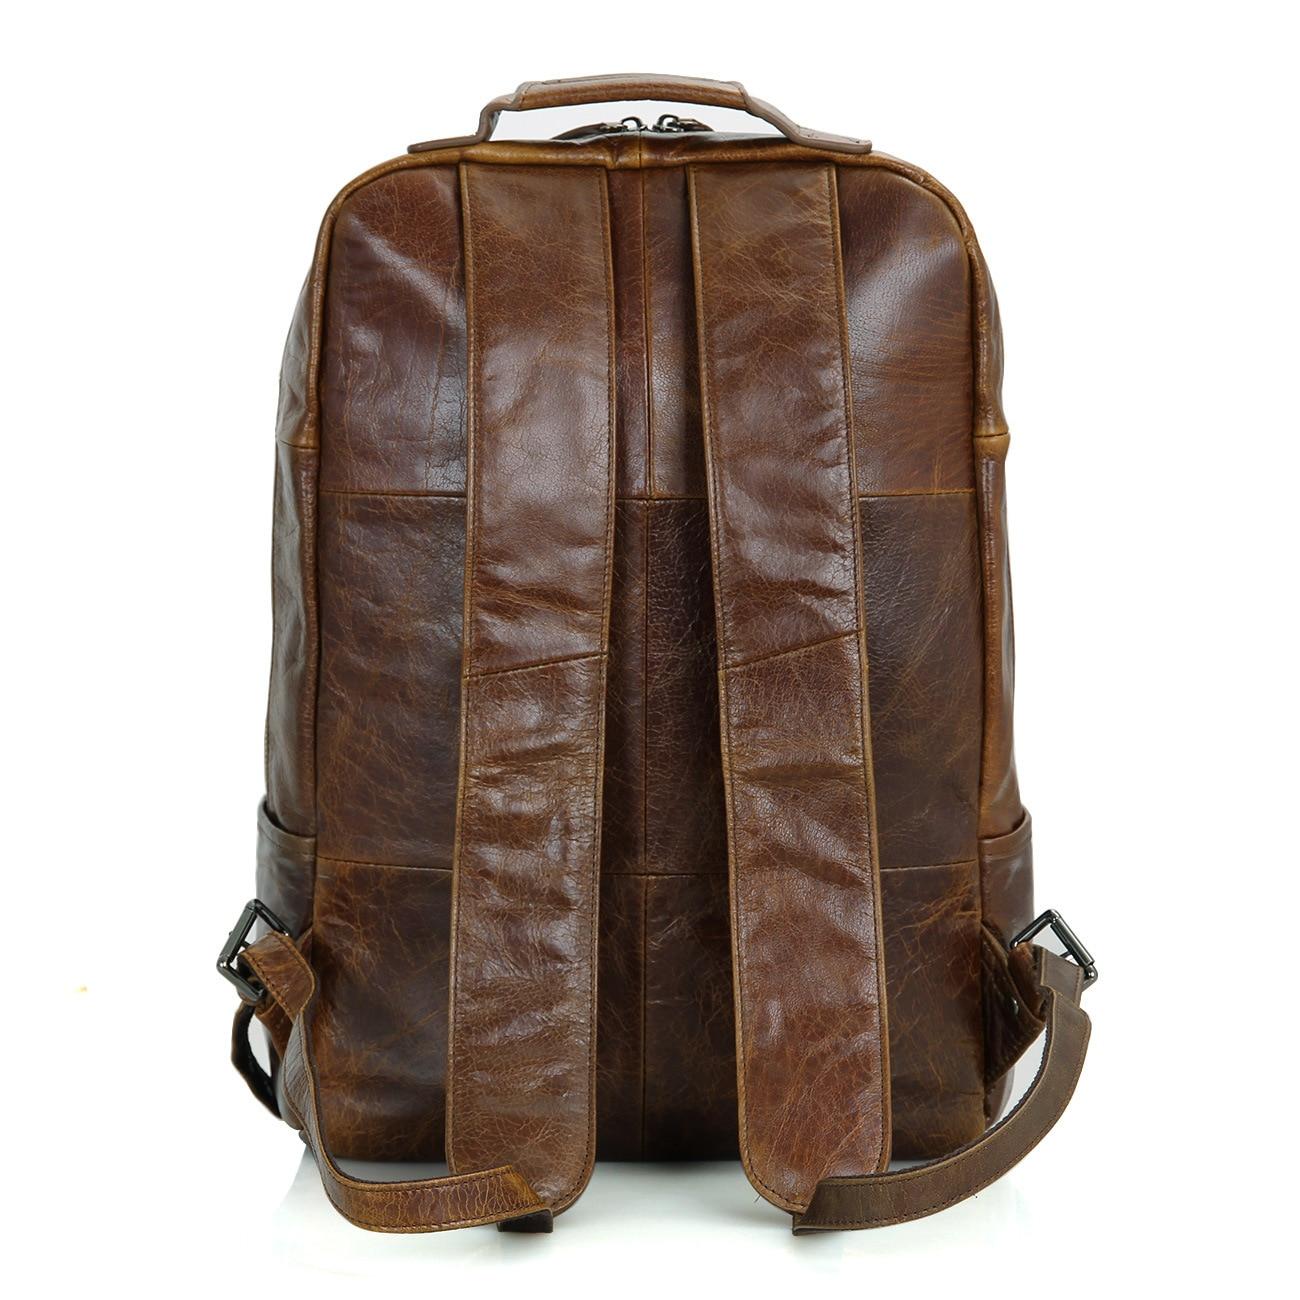 Head Layer Genuine Leather Both Shoulders Backpack Men Women Apply Concise Both Shoulders Package